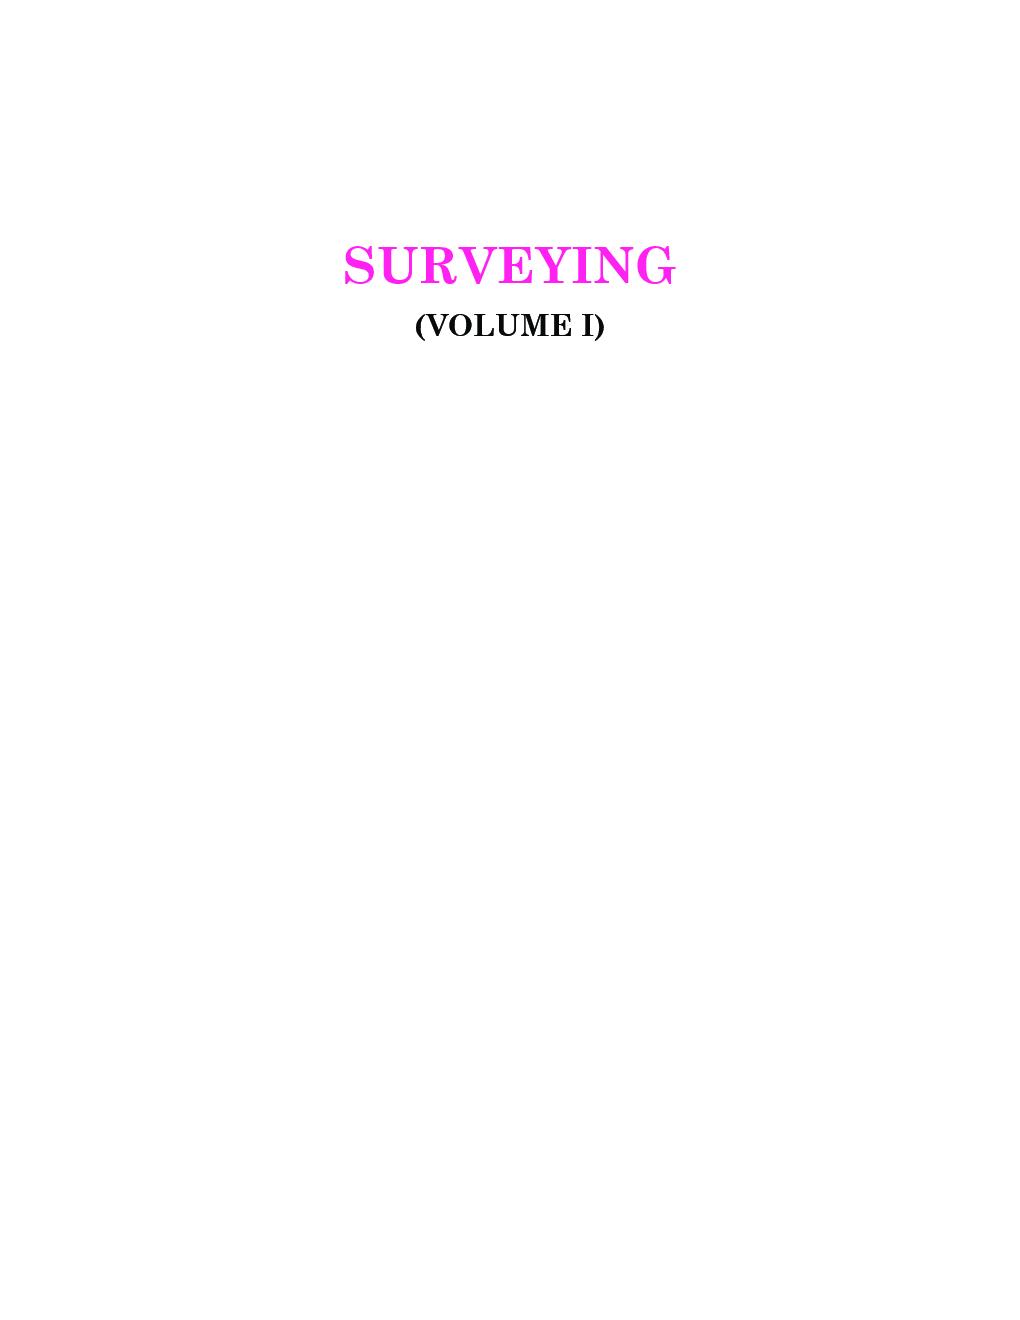 Surveying Vol. 1 - Page 2